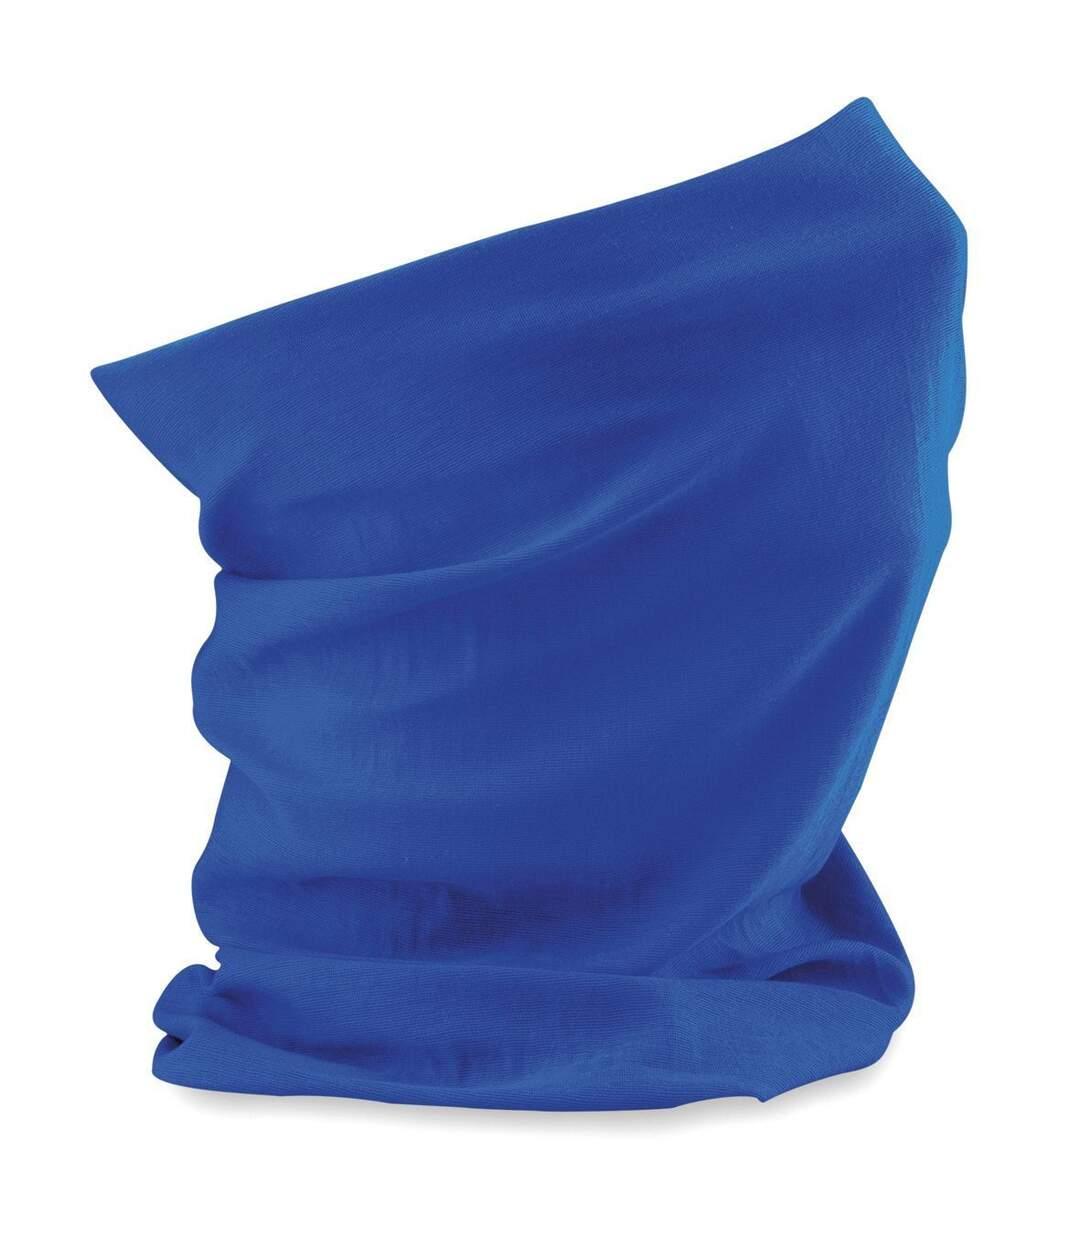 Echarpe tubulaire - tour de cou adulte - B900 - bleu roi